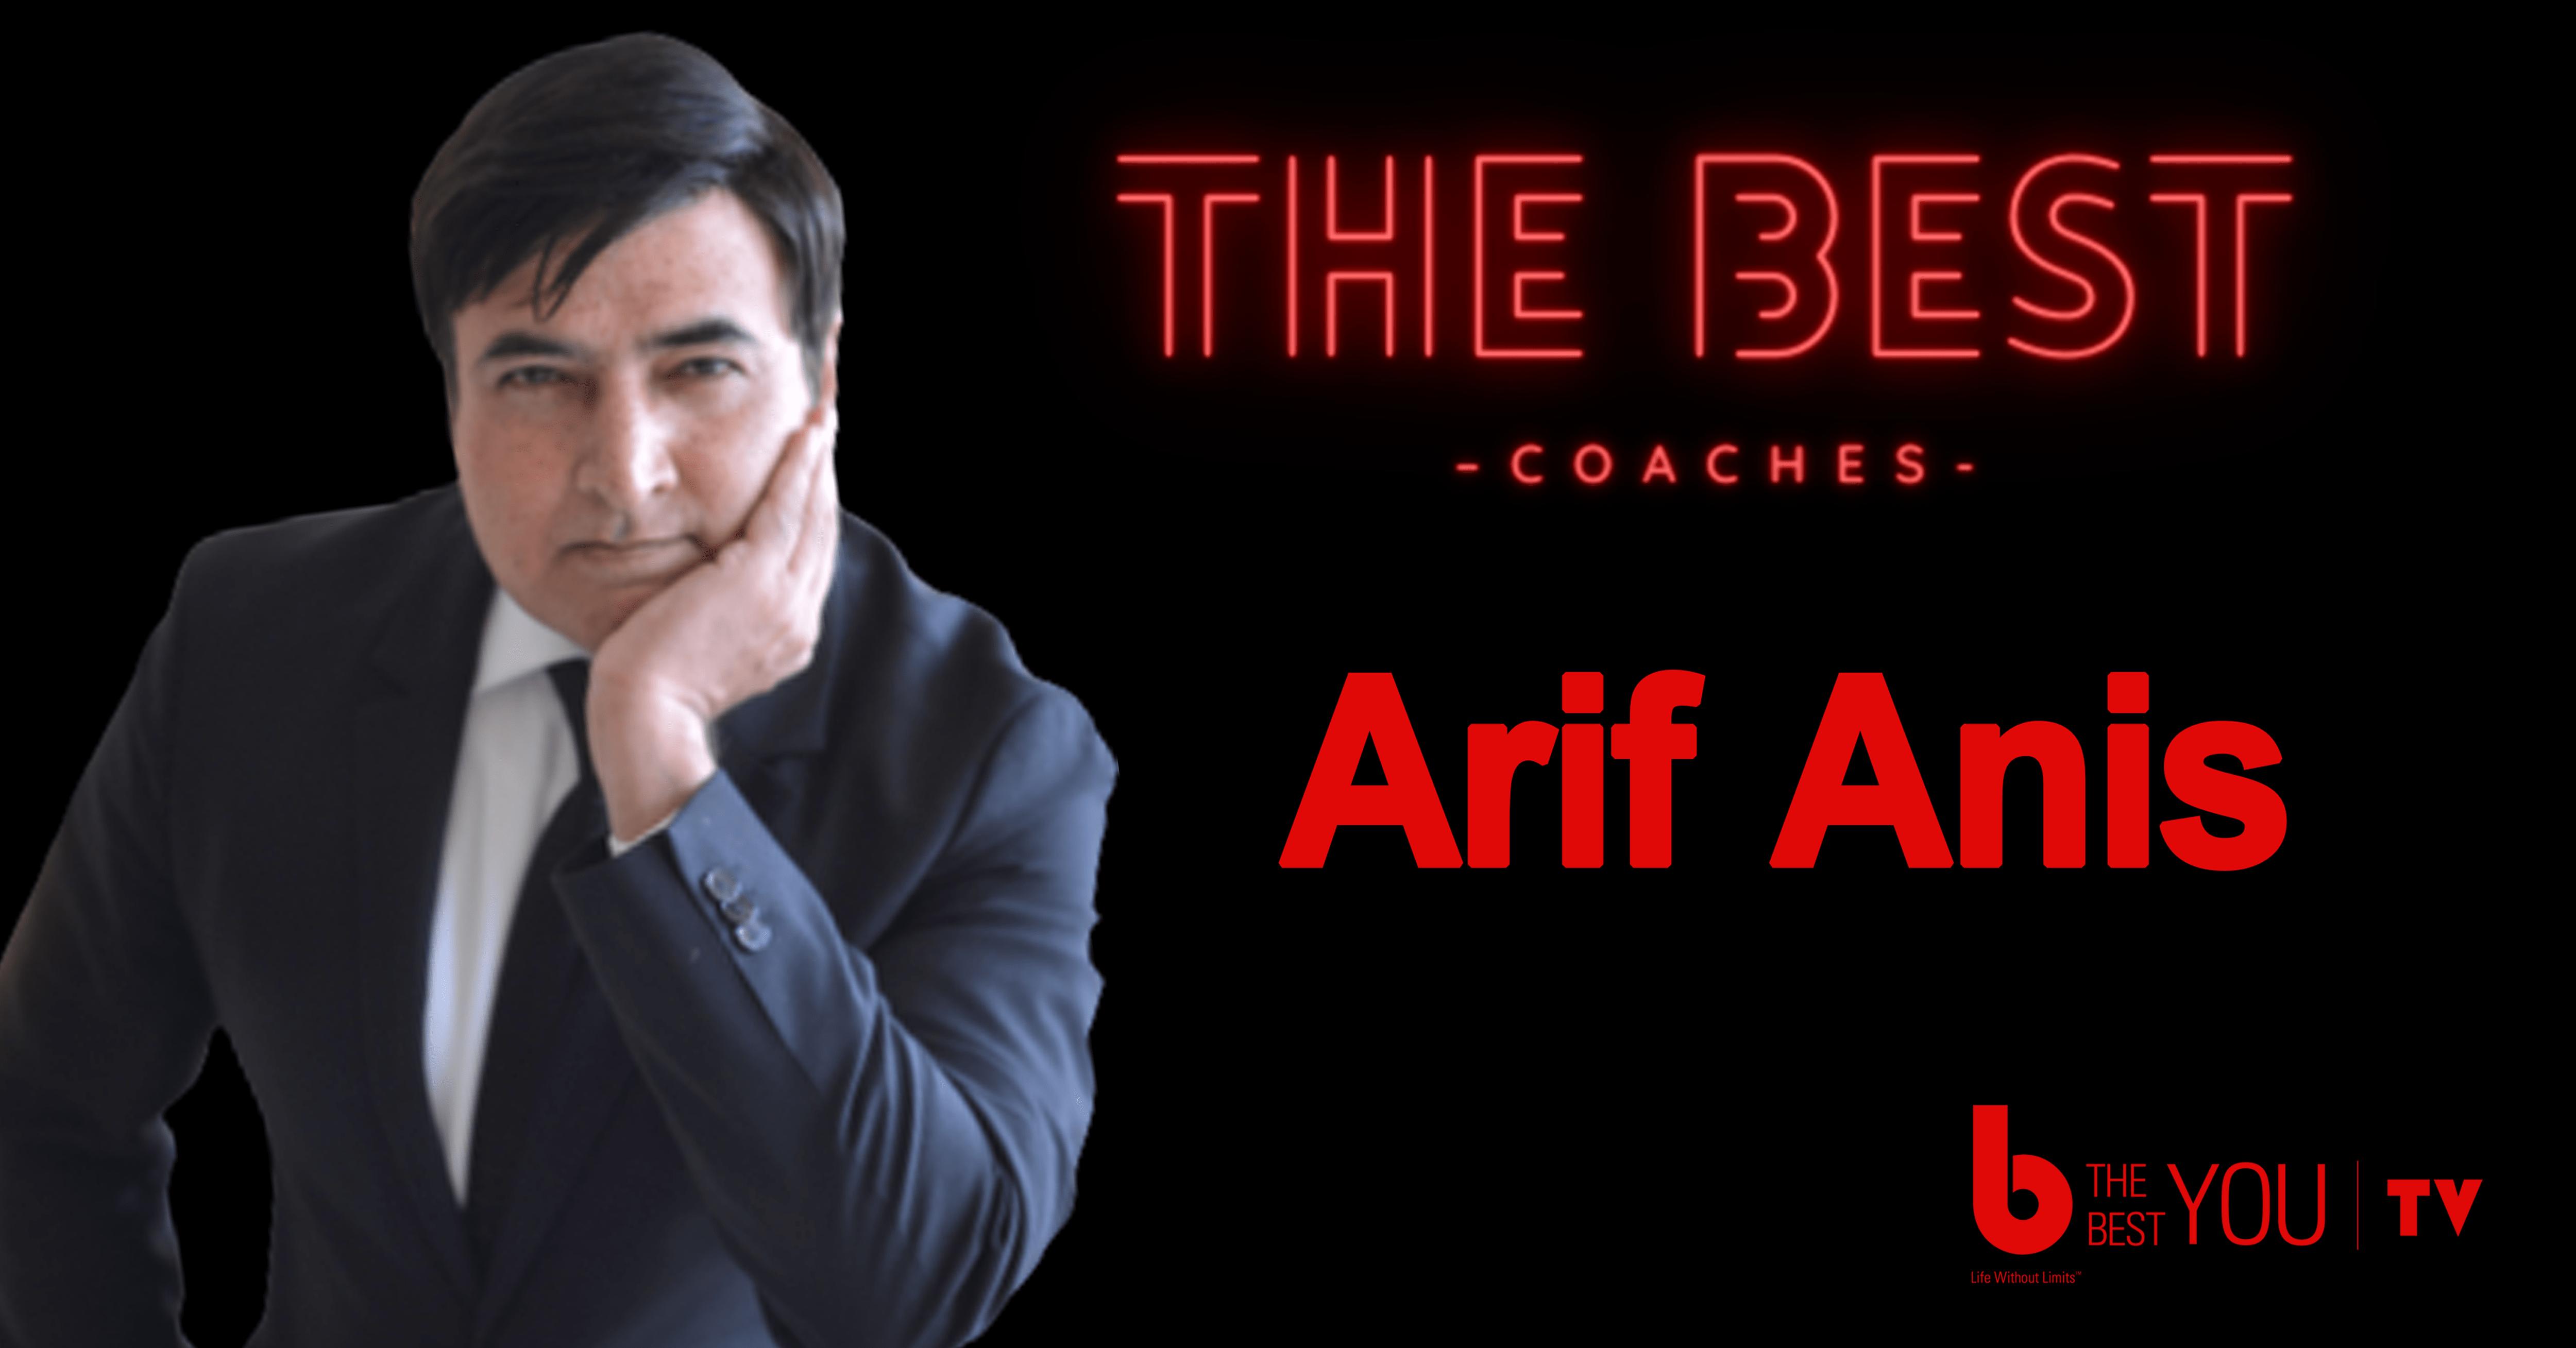 Arif Anis